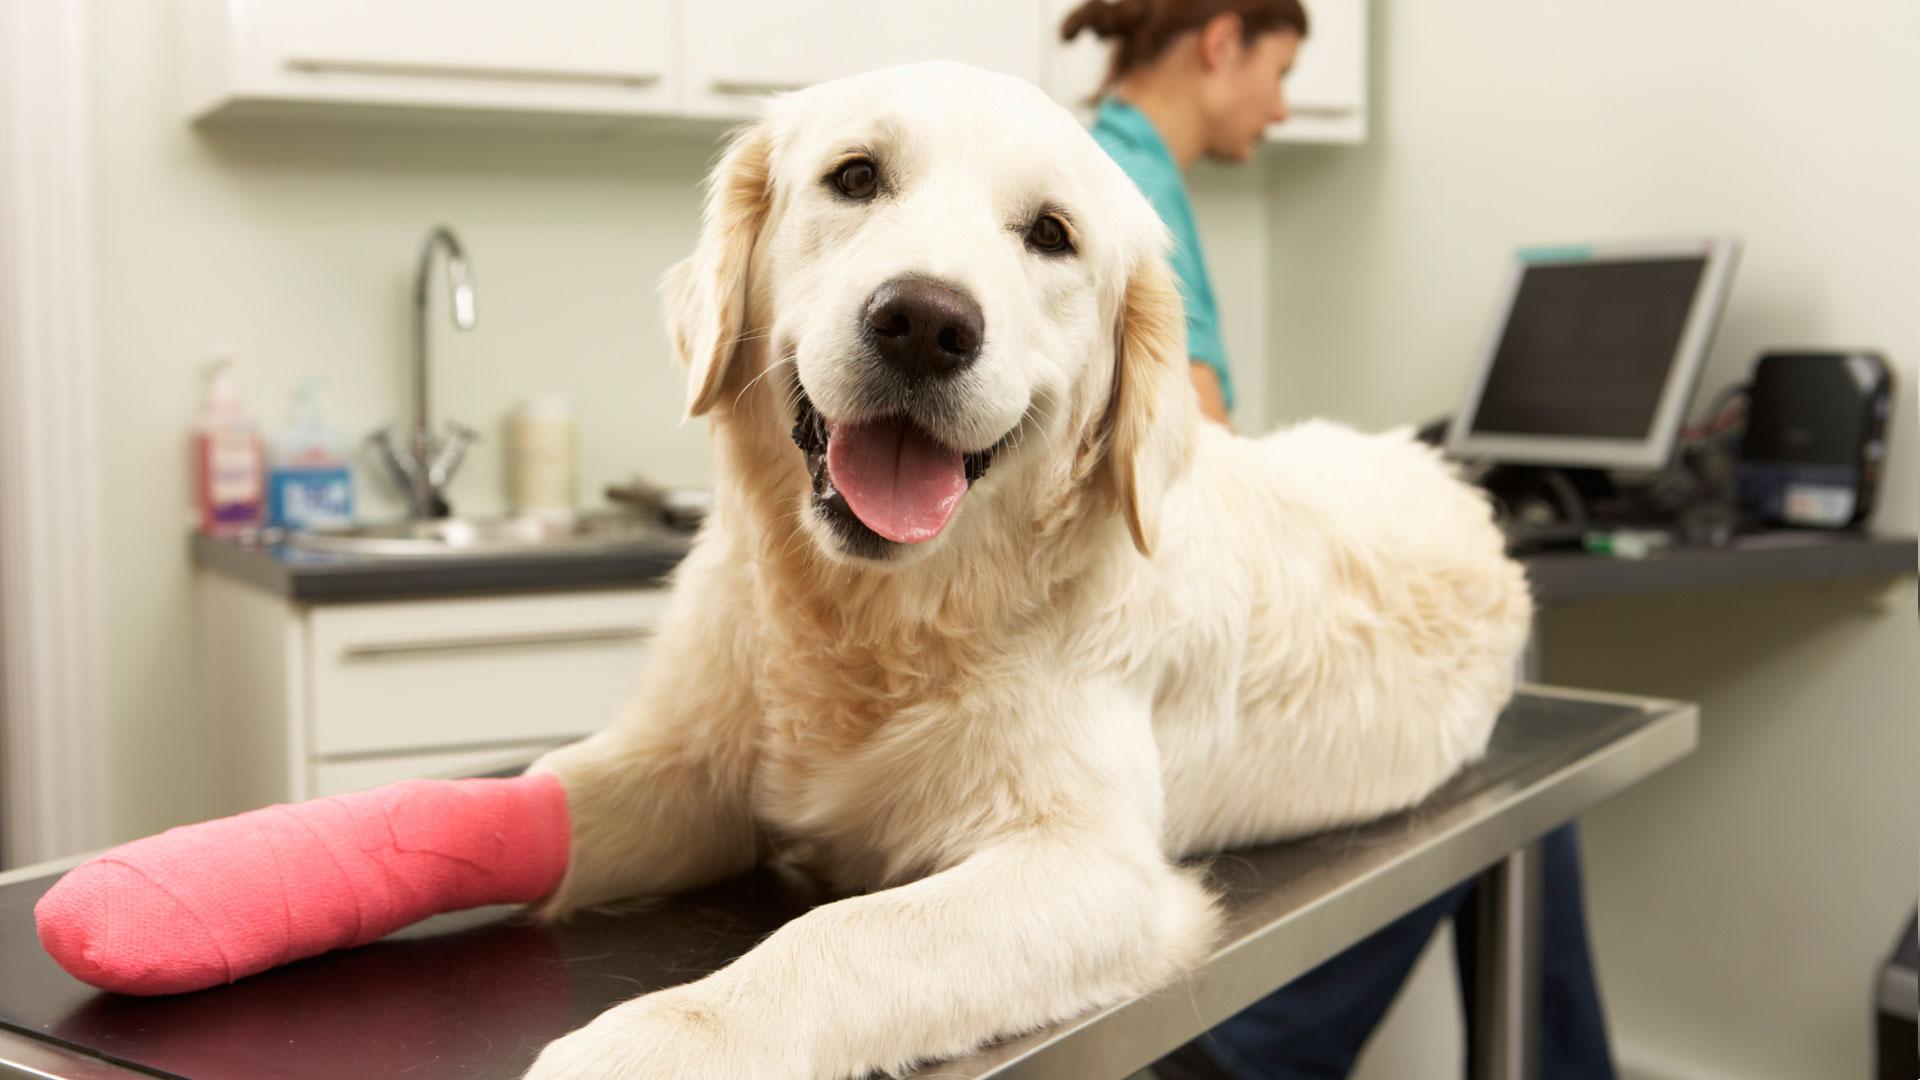 Female-Veterinary-Surgeon-Treating-Dog-In-Surgery